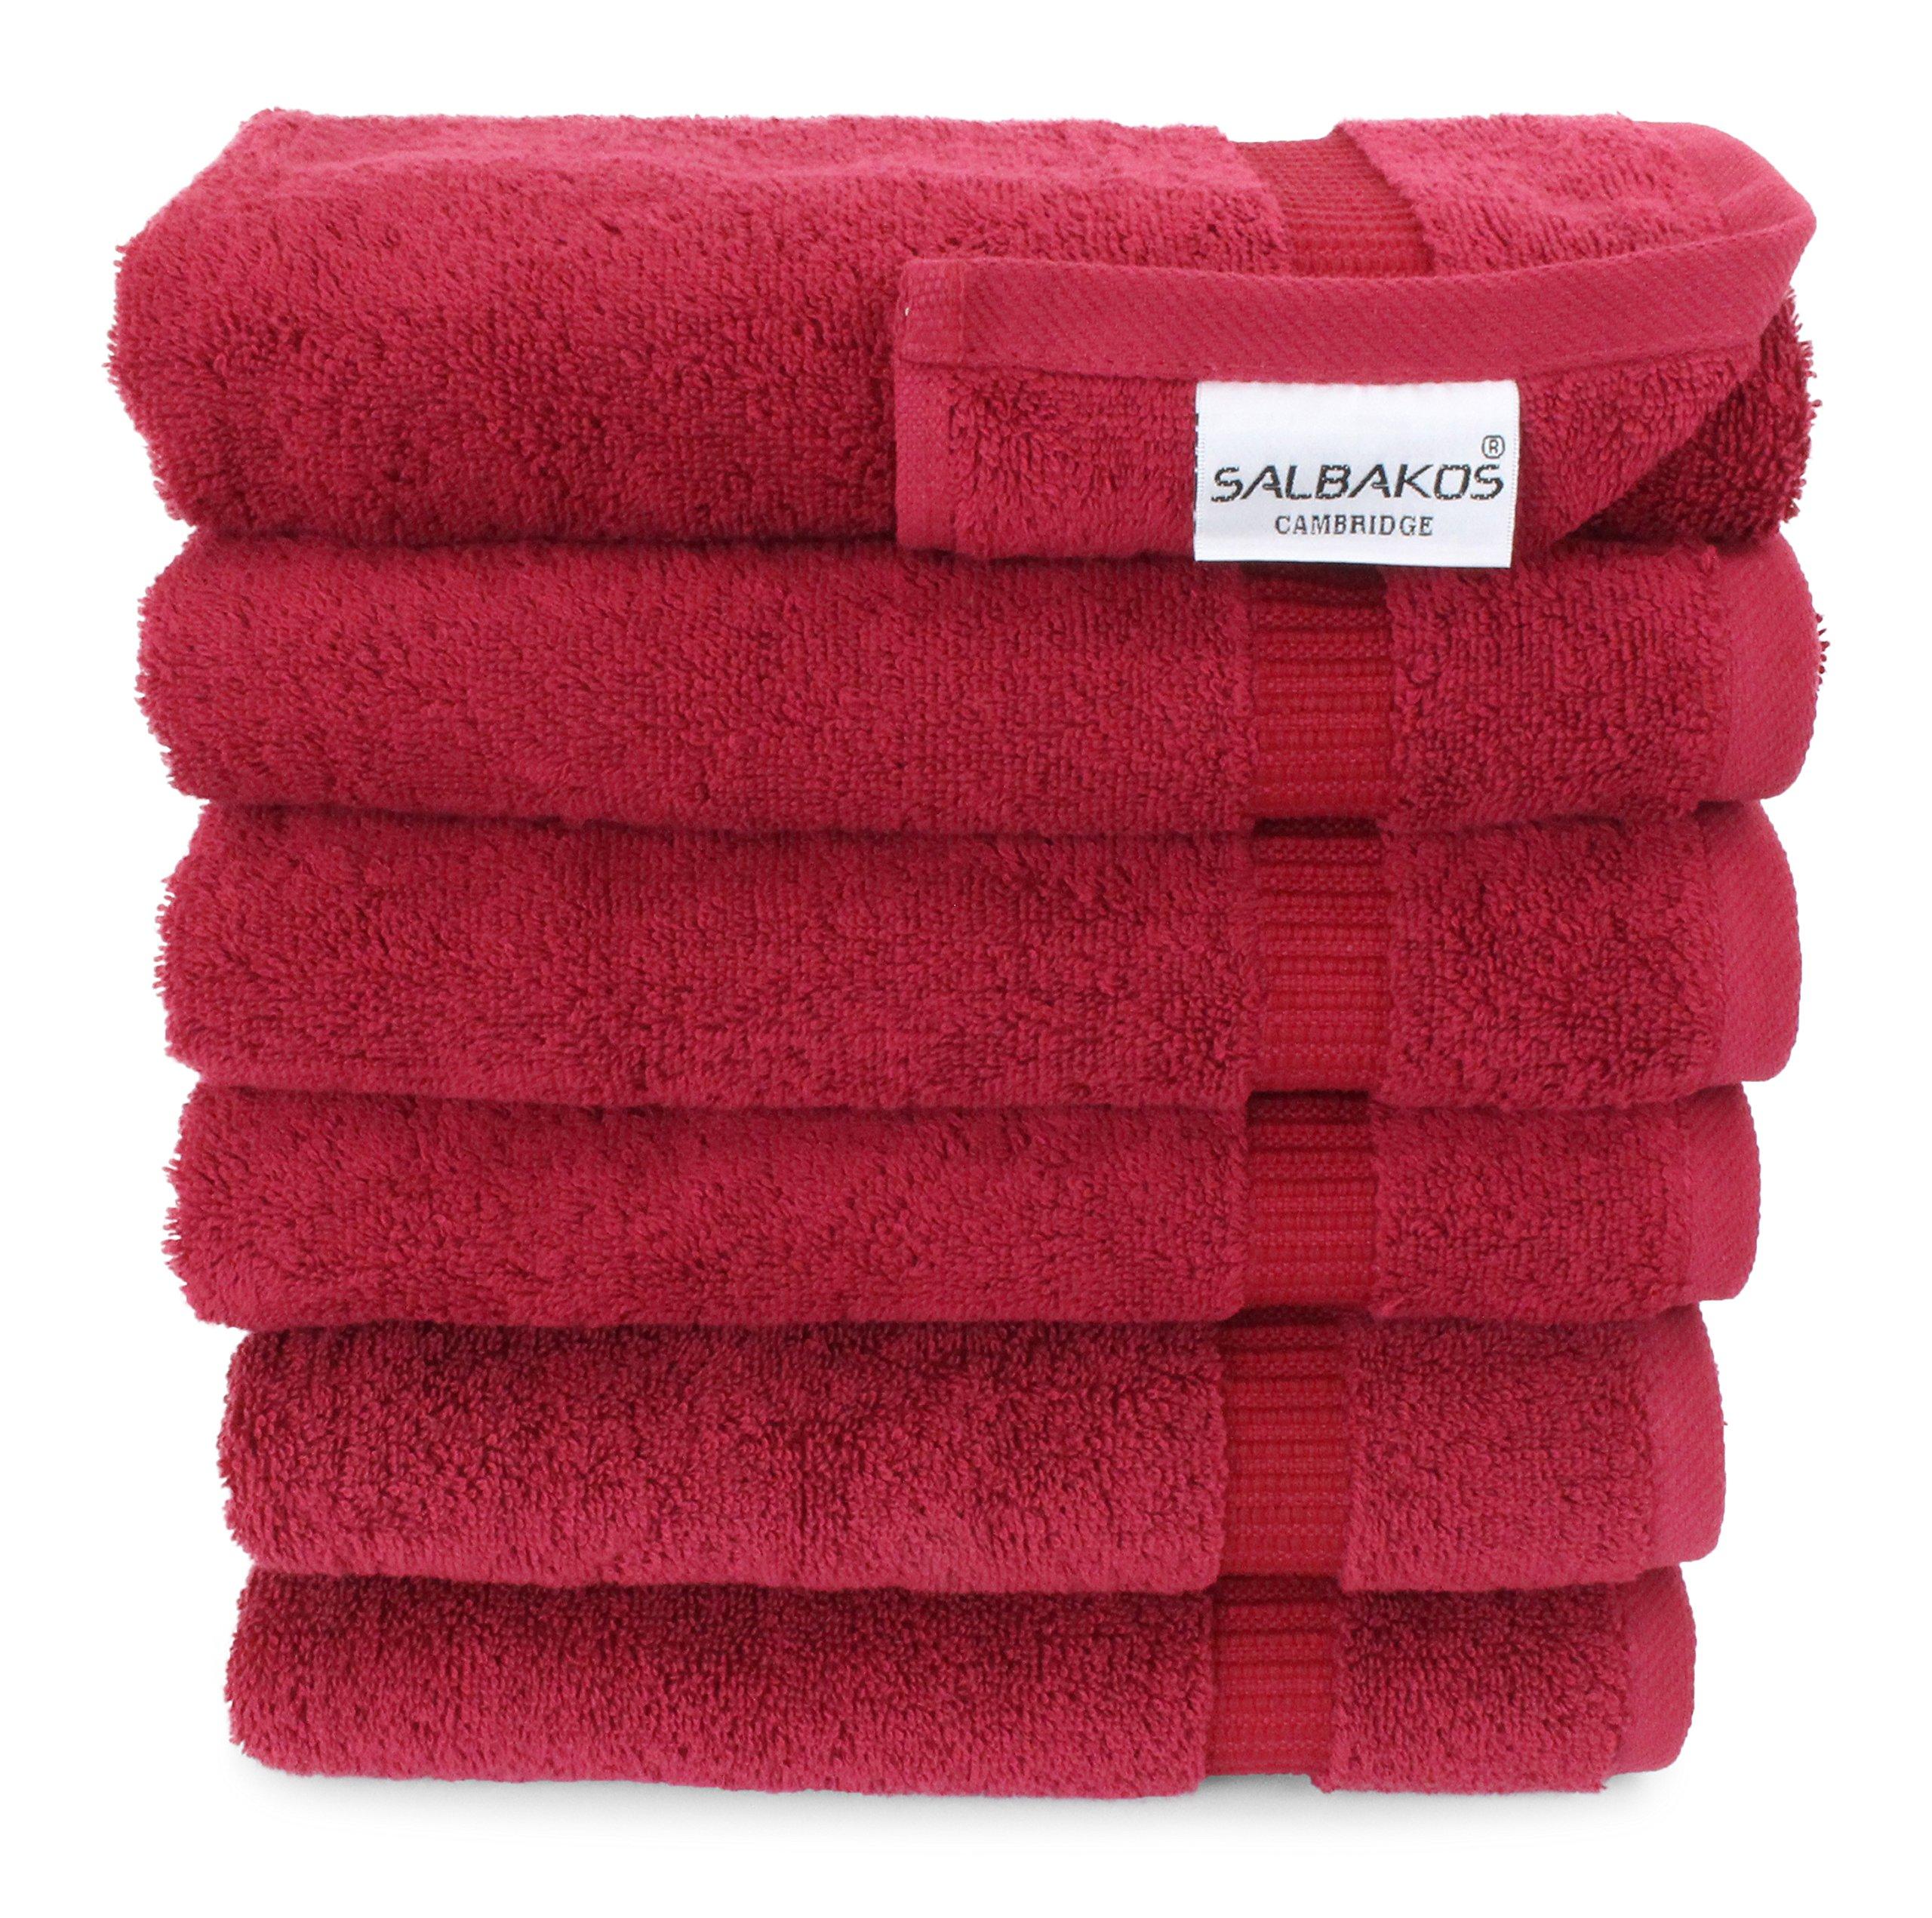 SALBAKOS Luxury Hotel & Spa Turkish Cotton 6-Piece Eco-Friendly Hand Towel Set 16 x 30 Inch, Wine